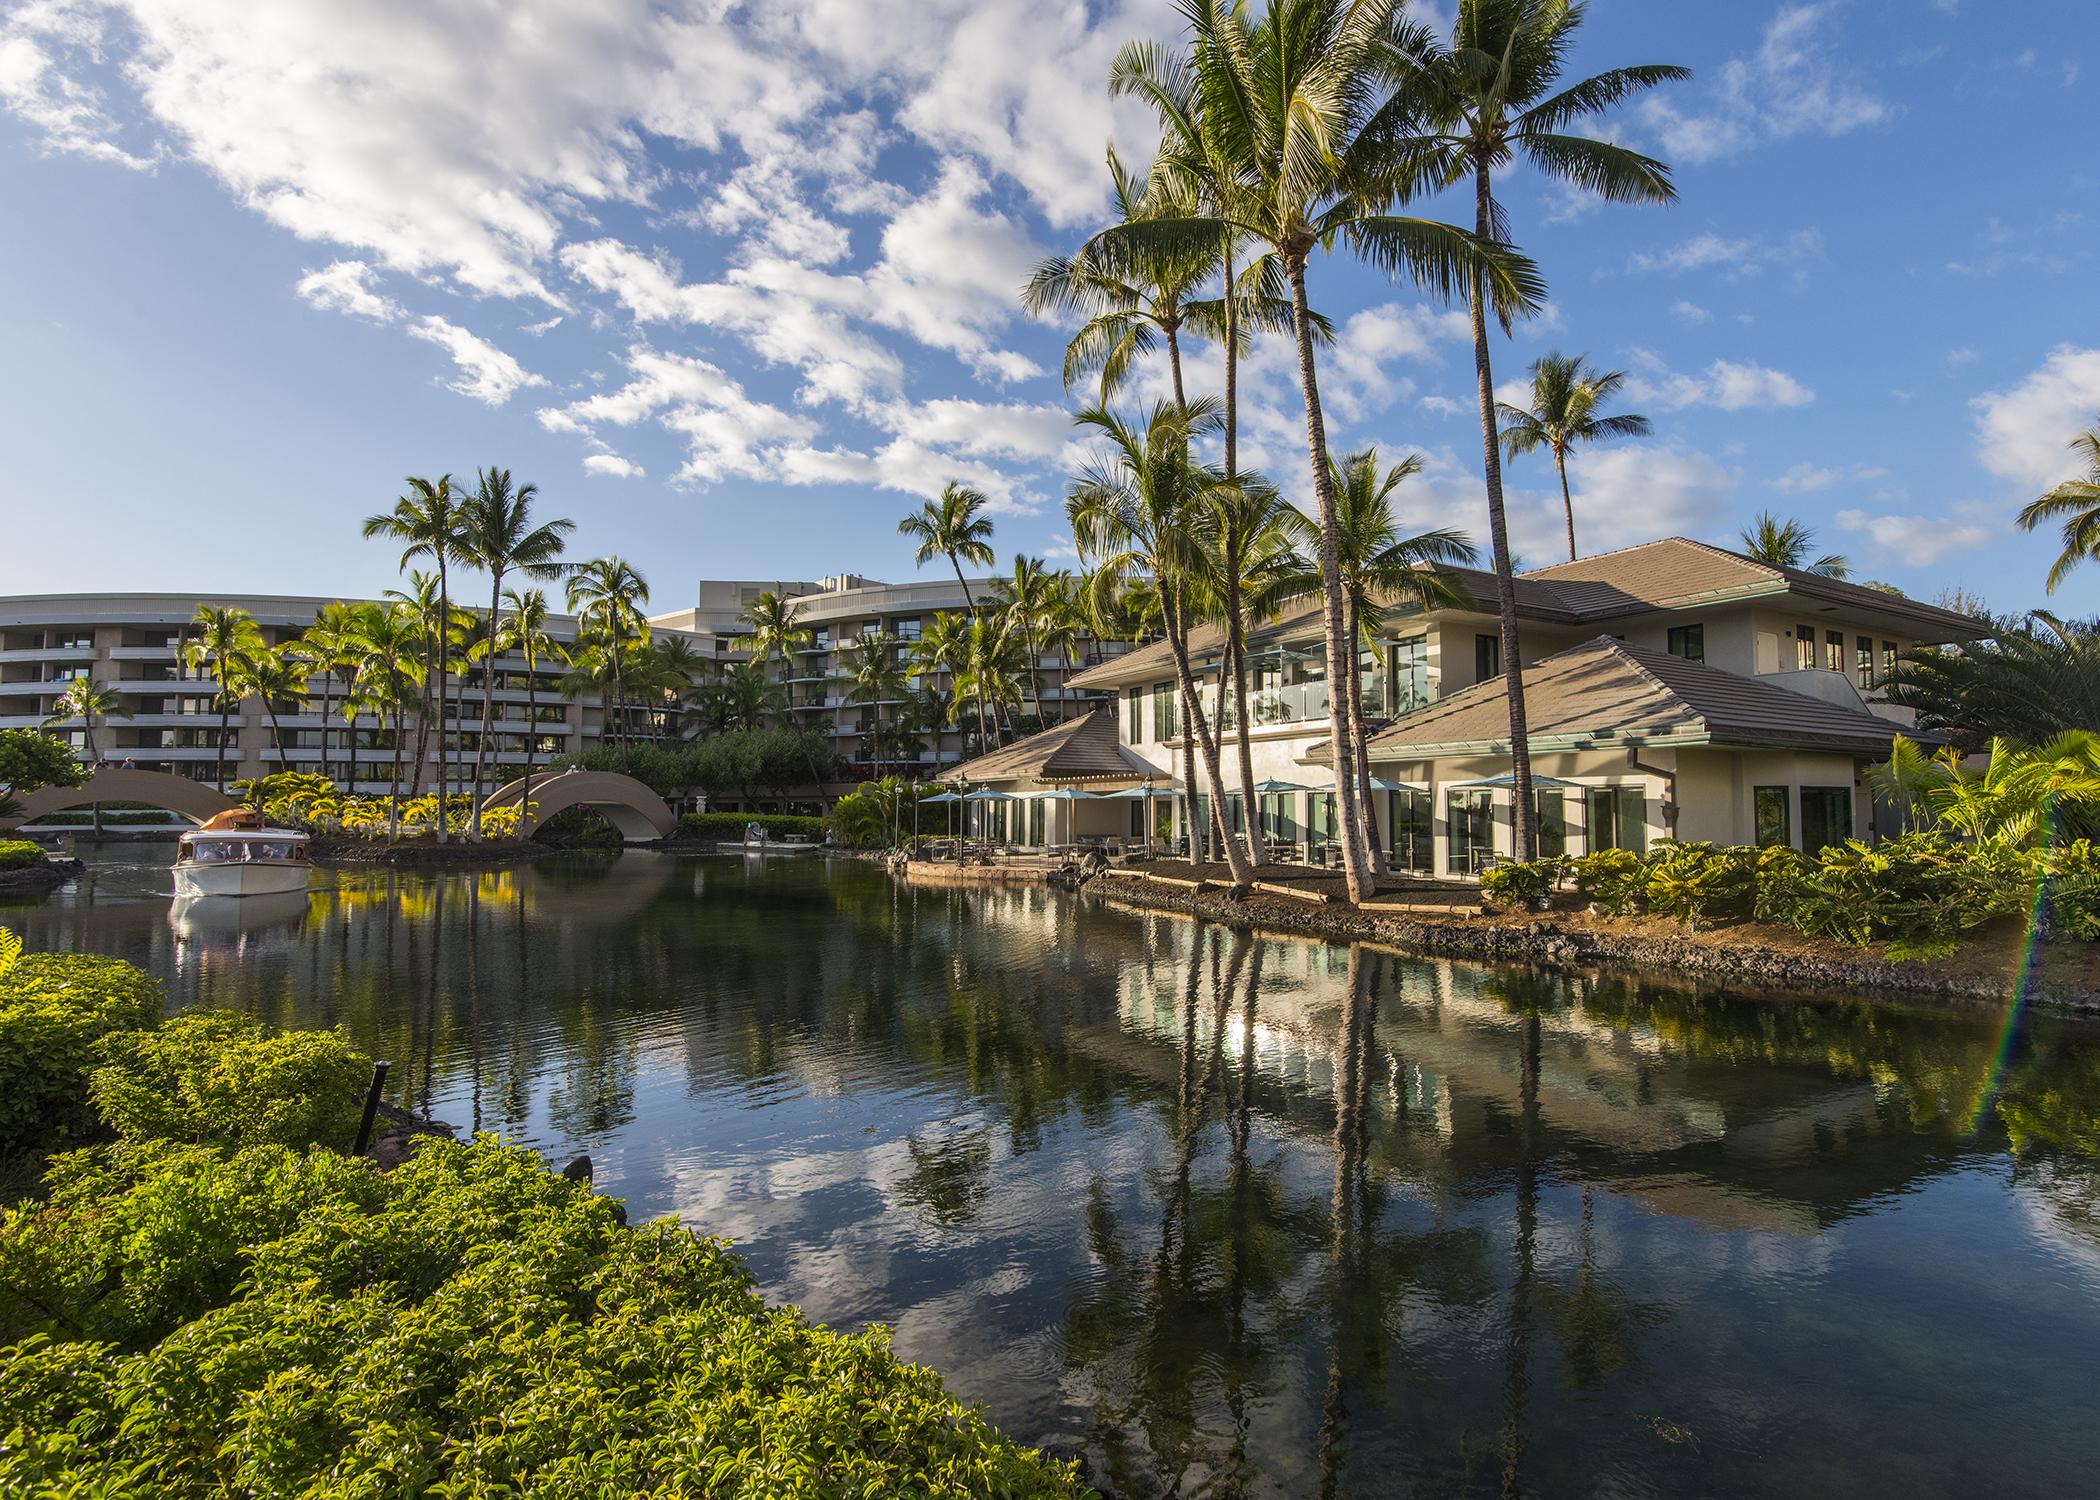 Industry Open House Waikoloa - 9/10/19 - Hilton Grand ...